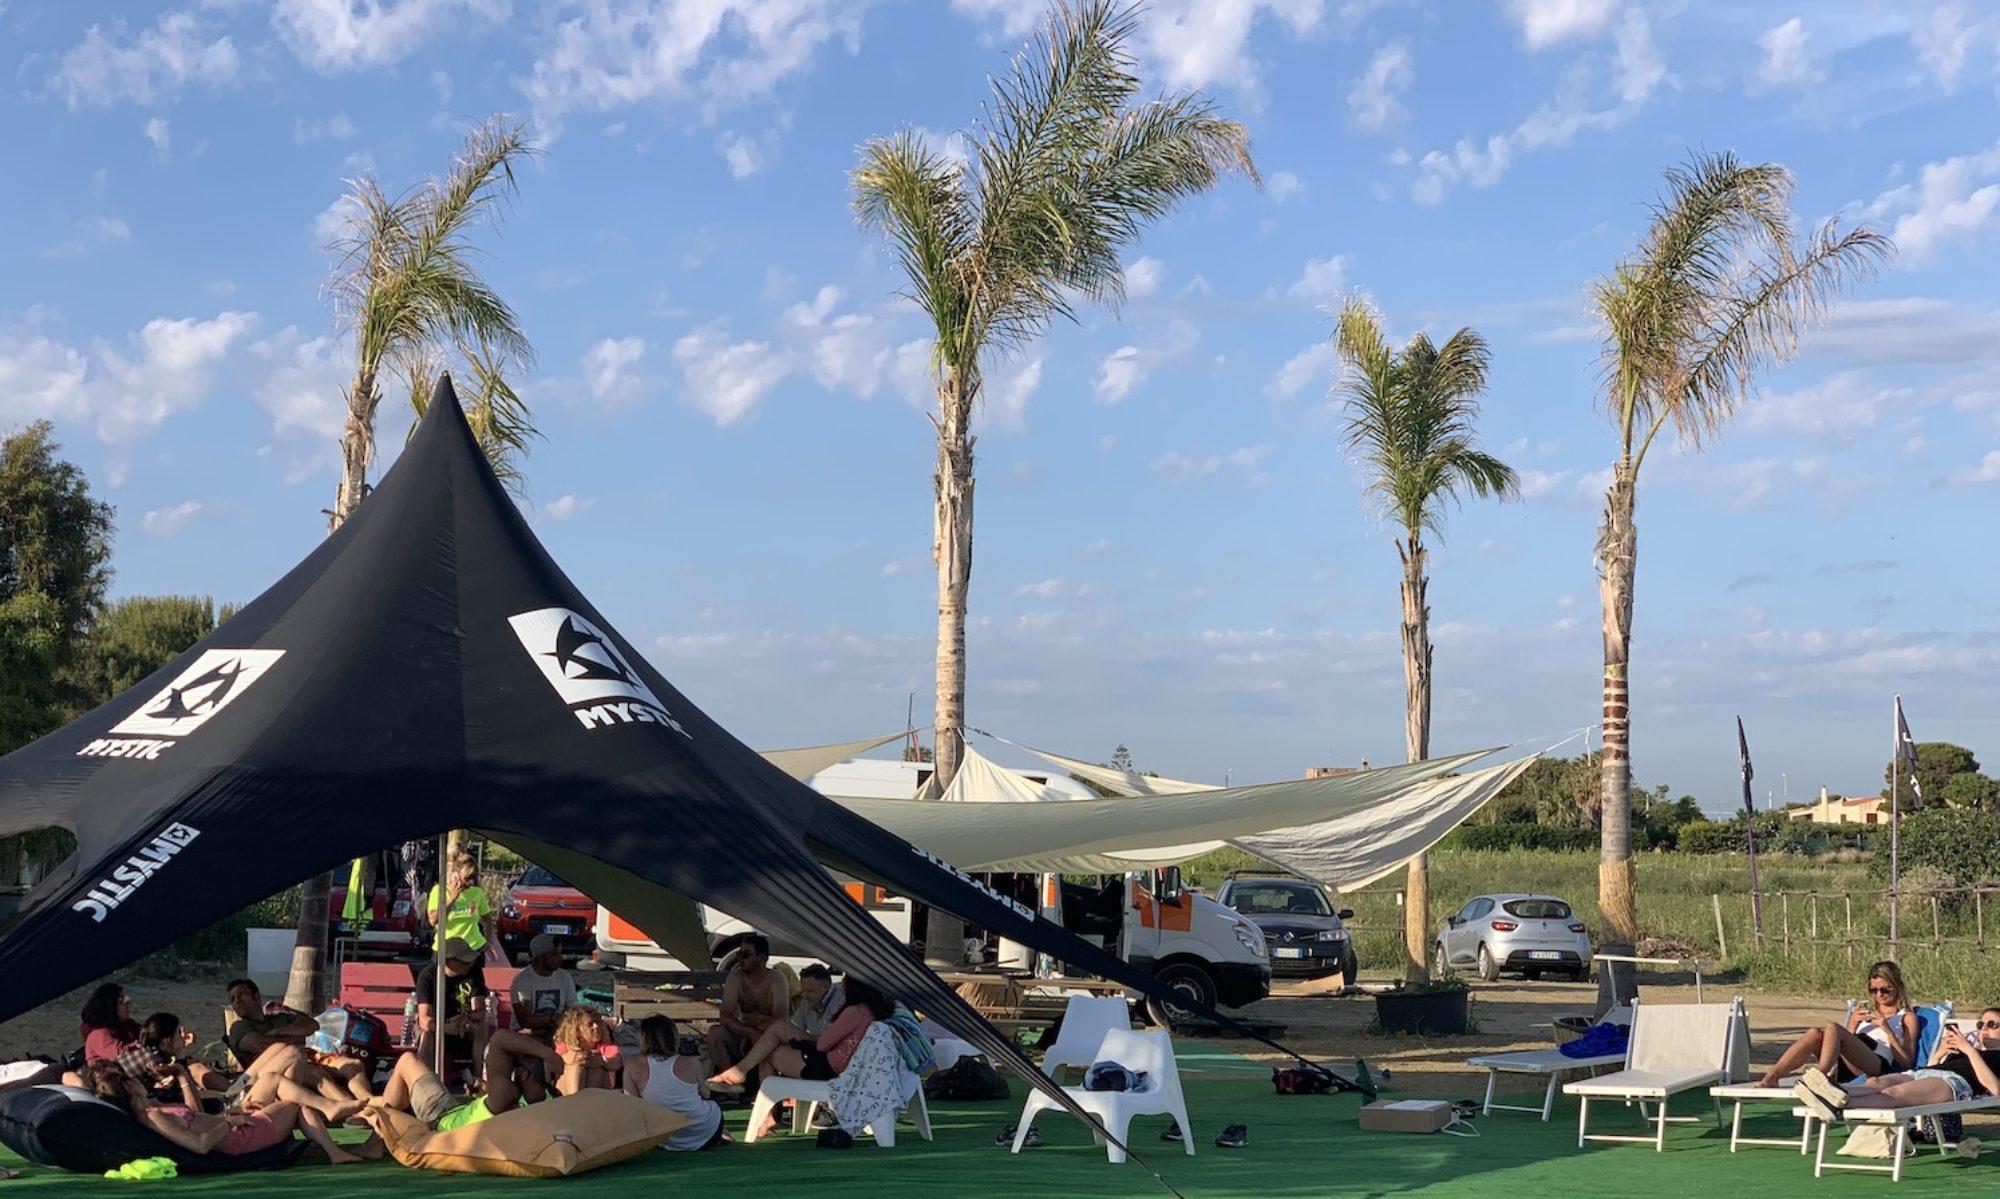 Sicily Kiteboarding - International Kitesurf Center